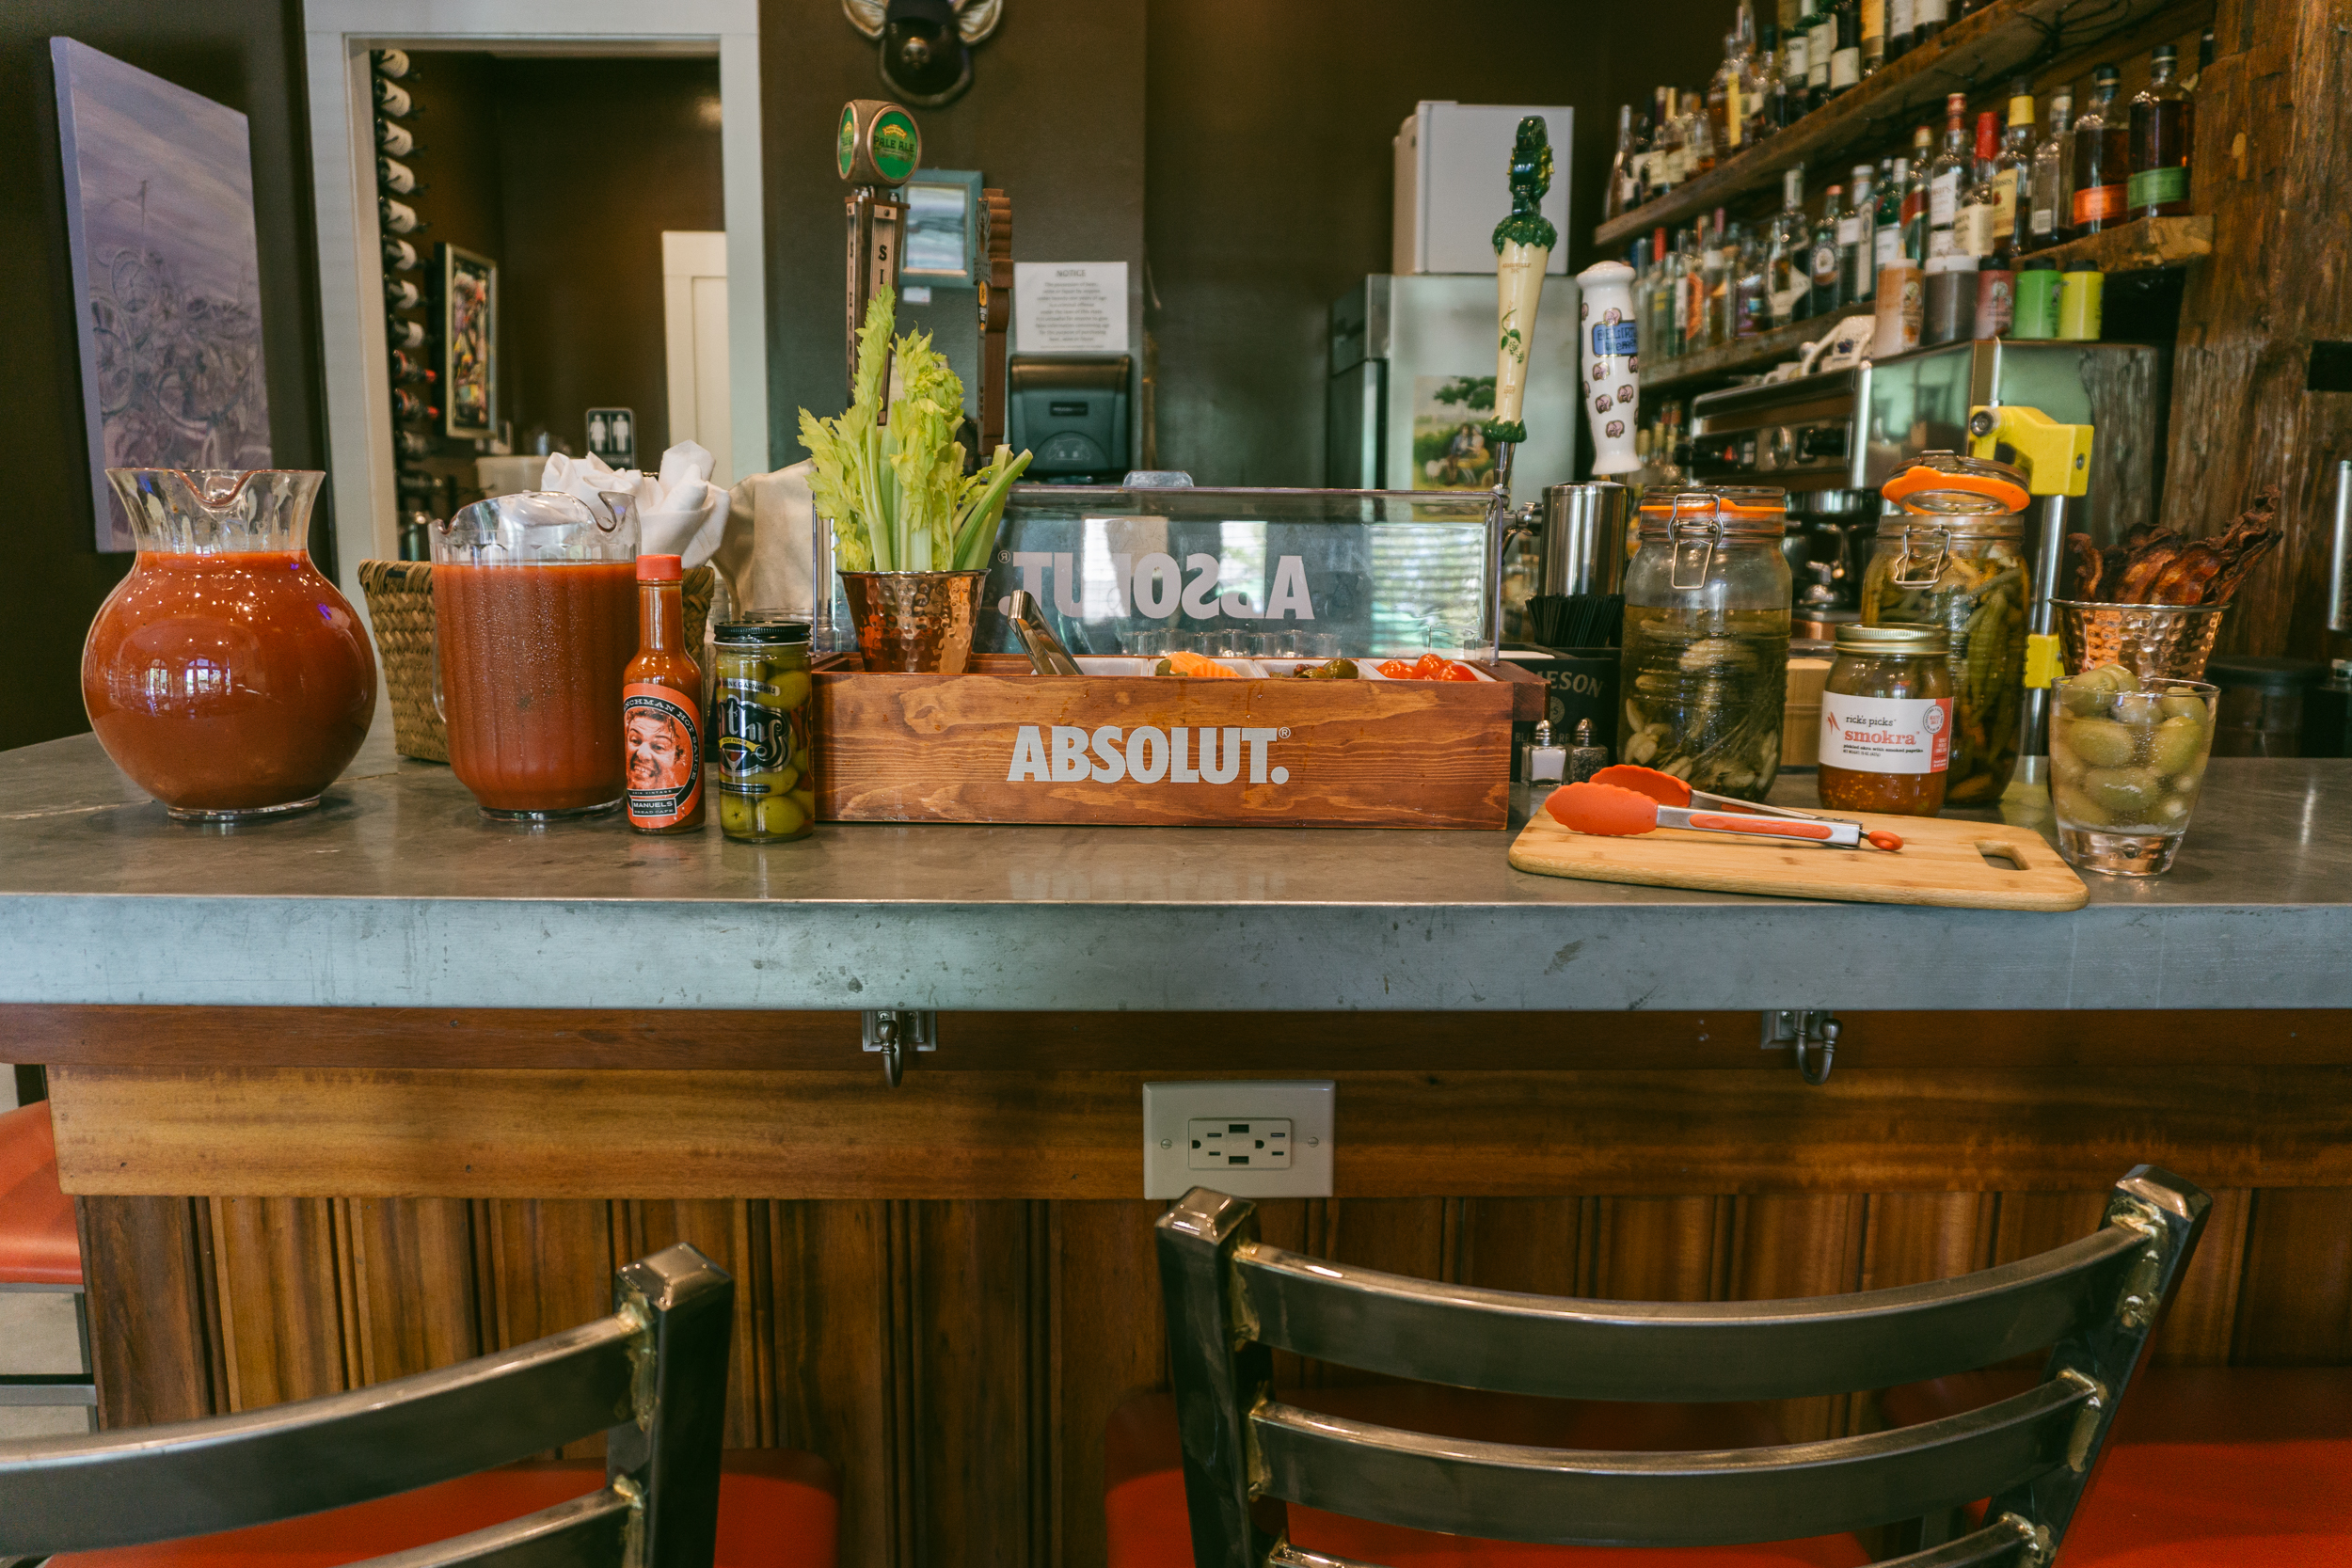 Bloody mary bar at Hammond's Ferry Larder in North Augusta